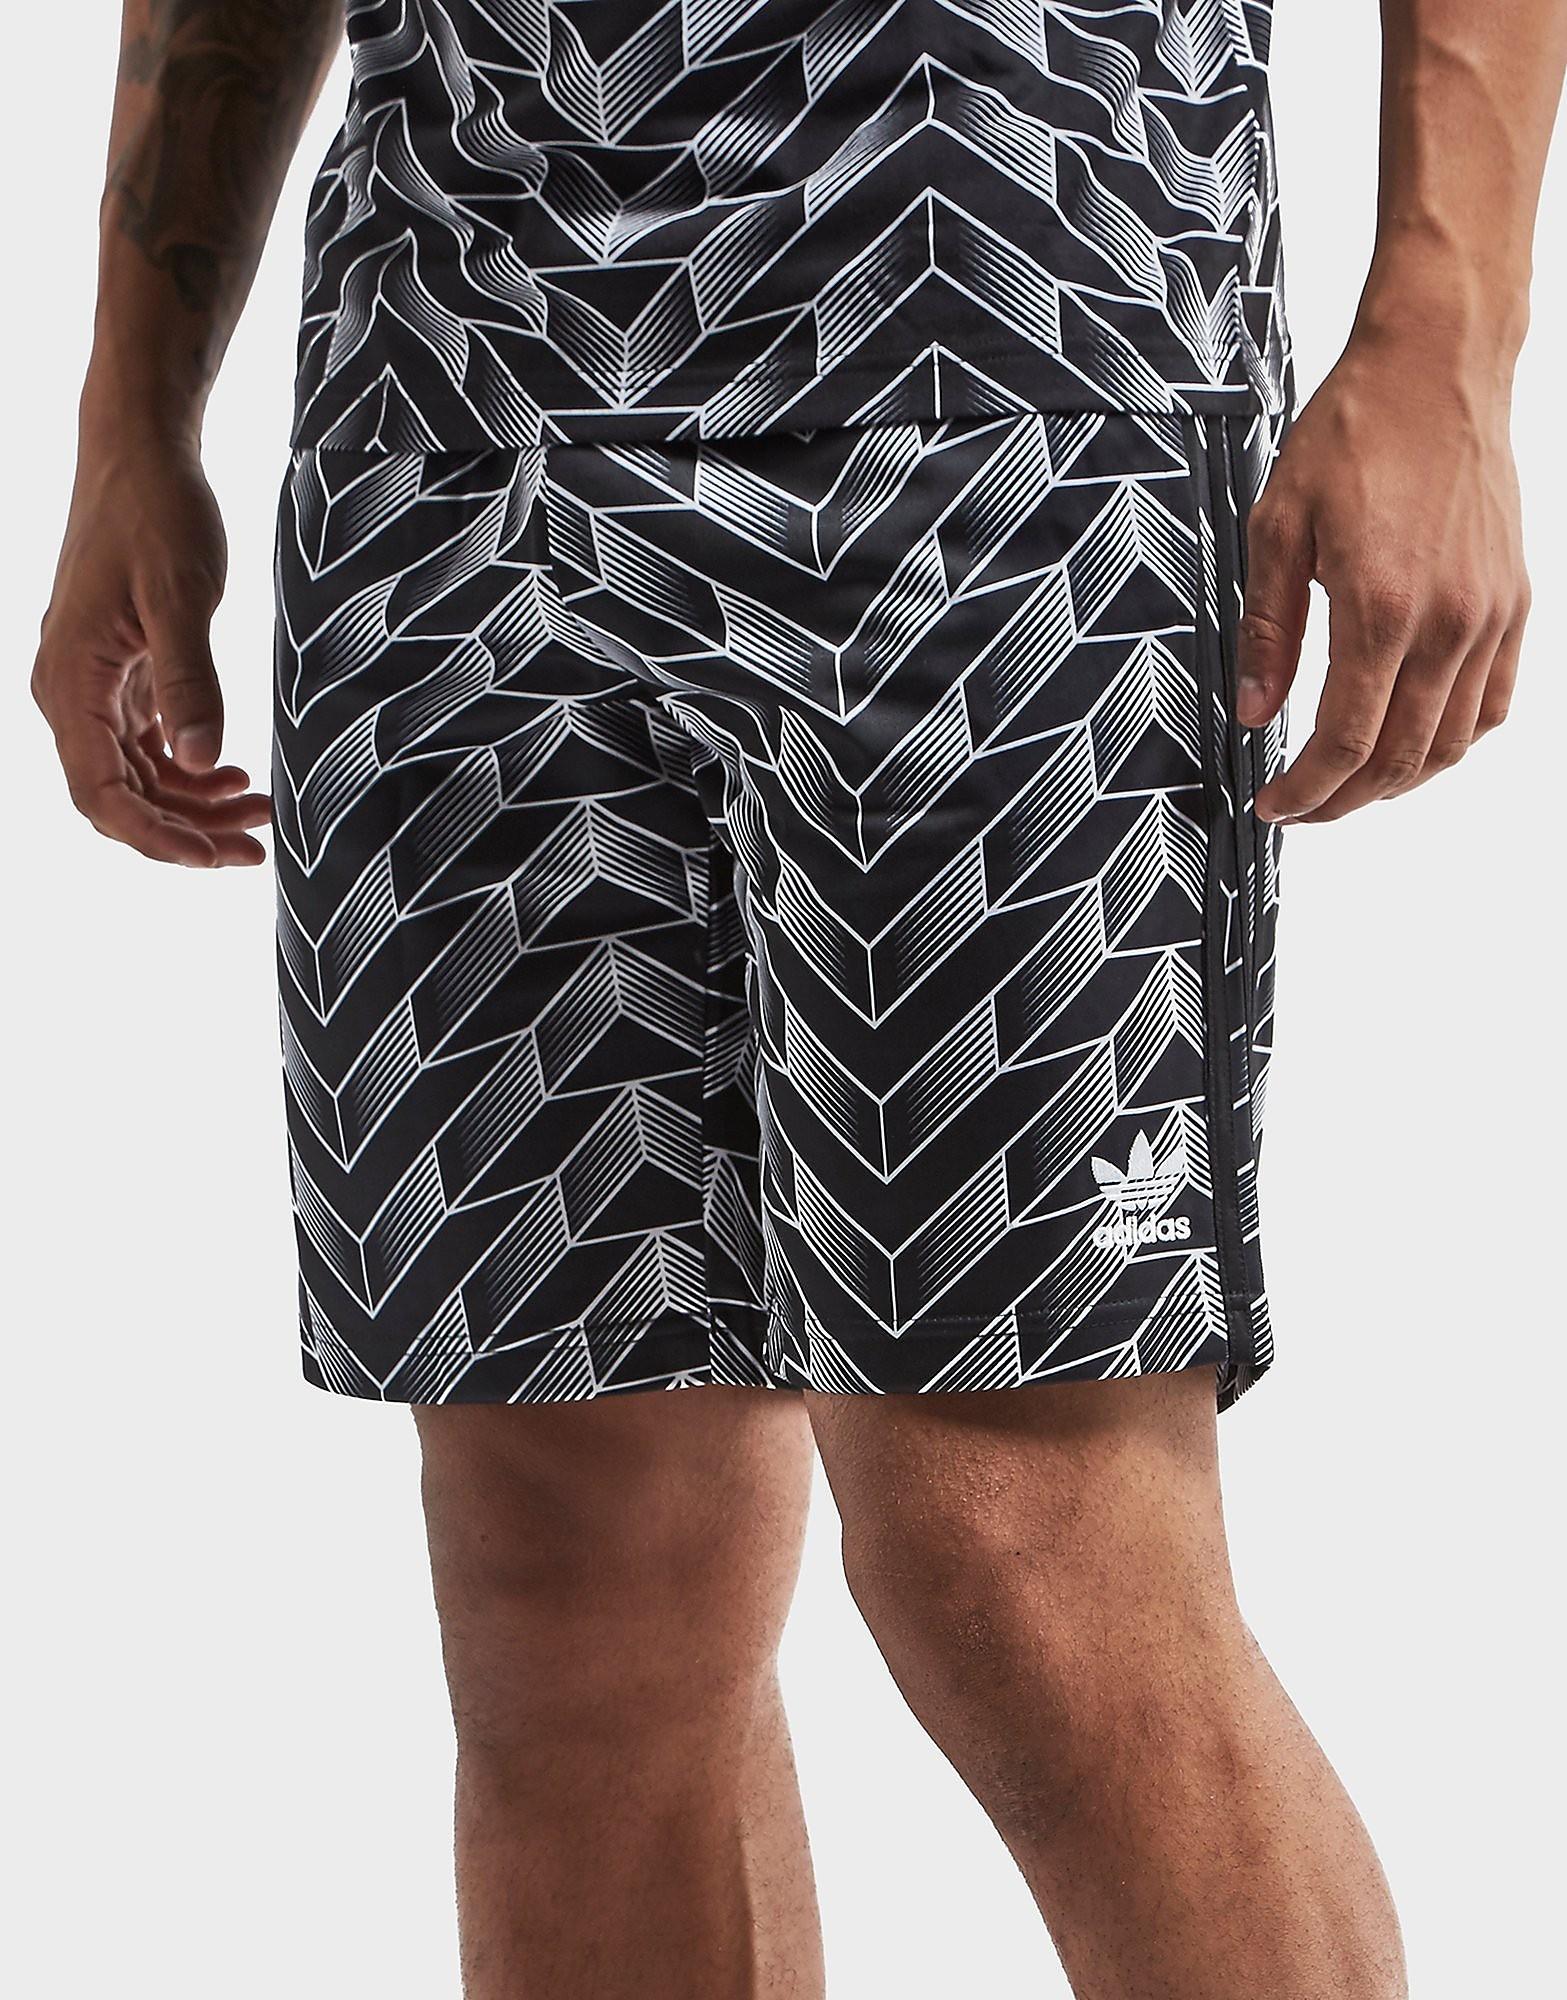 adidas Originals Soccer Shorts